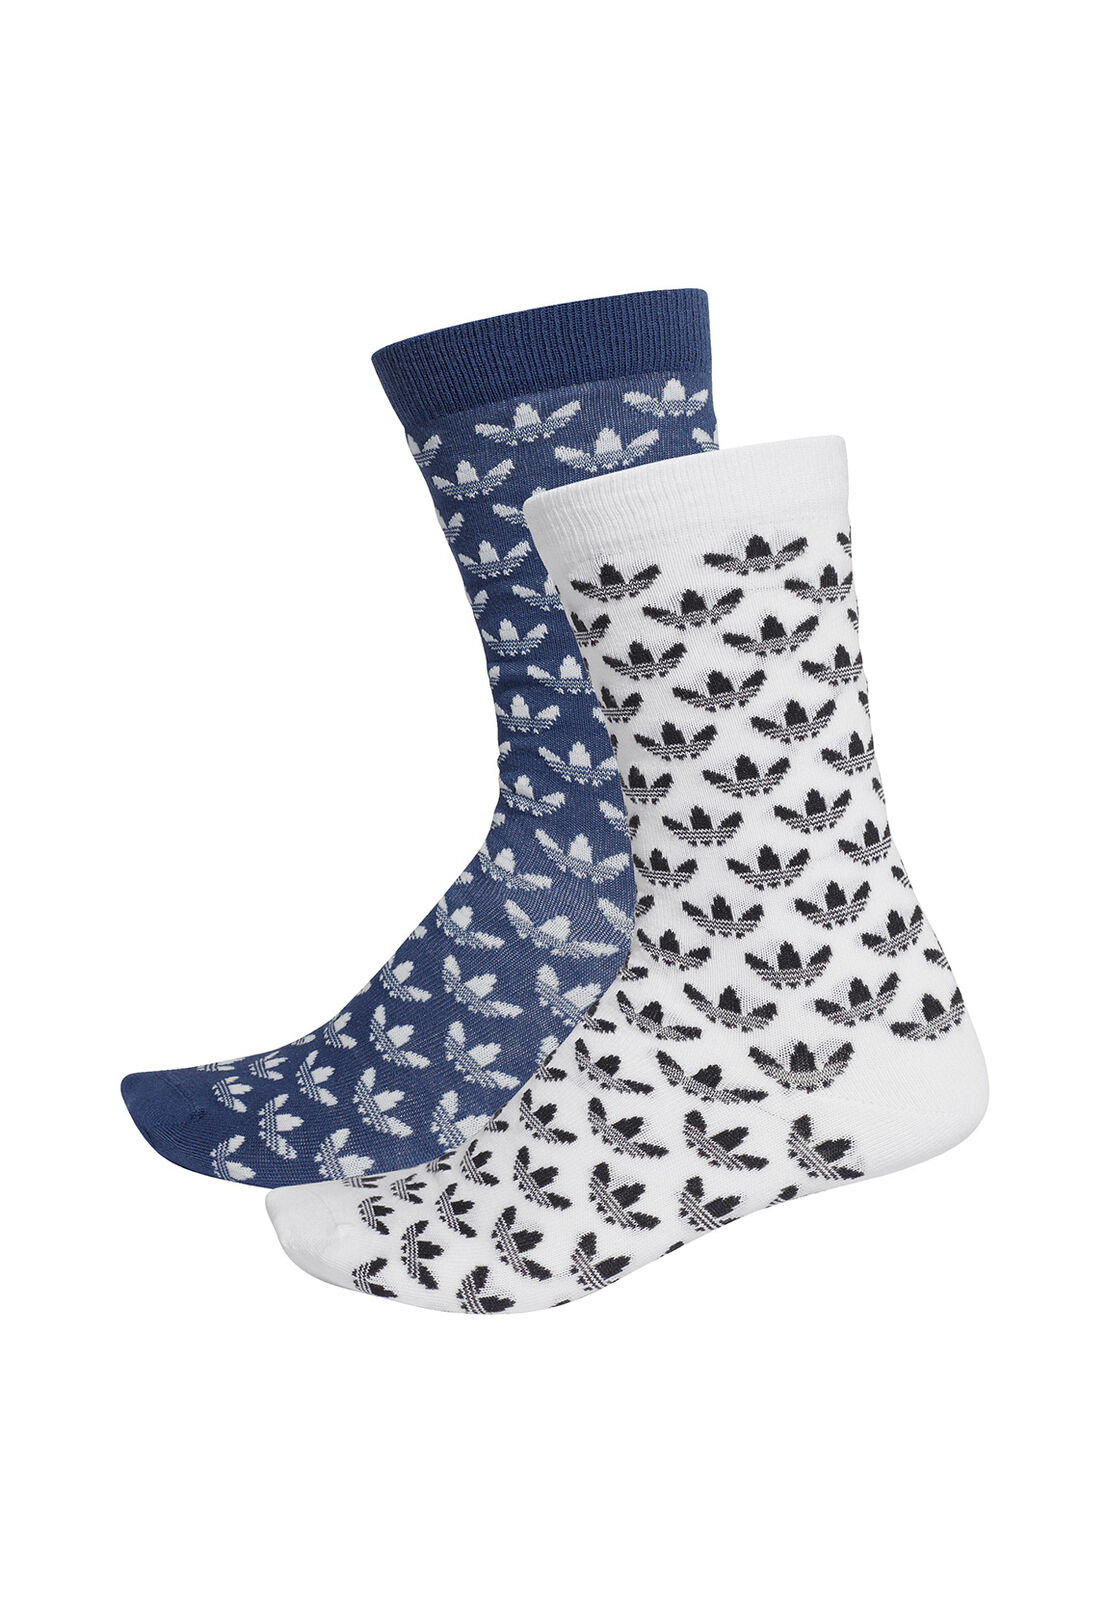 Adidas Originals Socken Doppelpack THIN CR SOCK GR FM0679 Weiss Dunkelblau